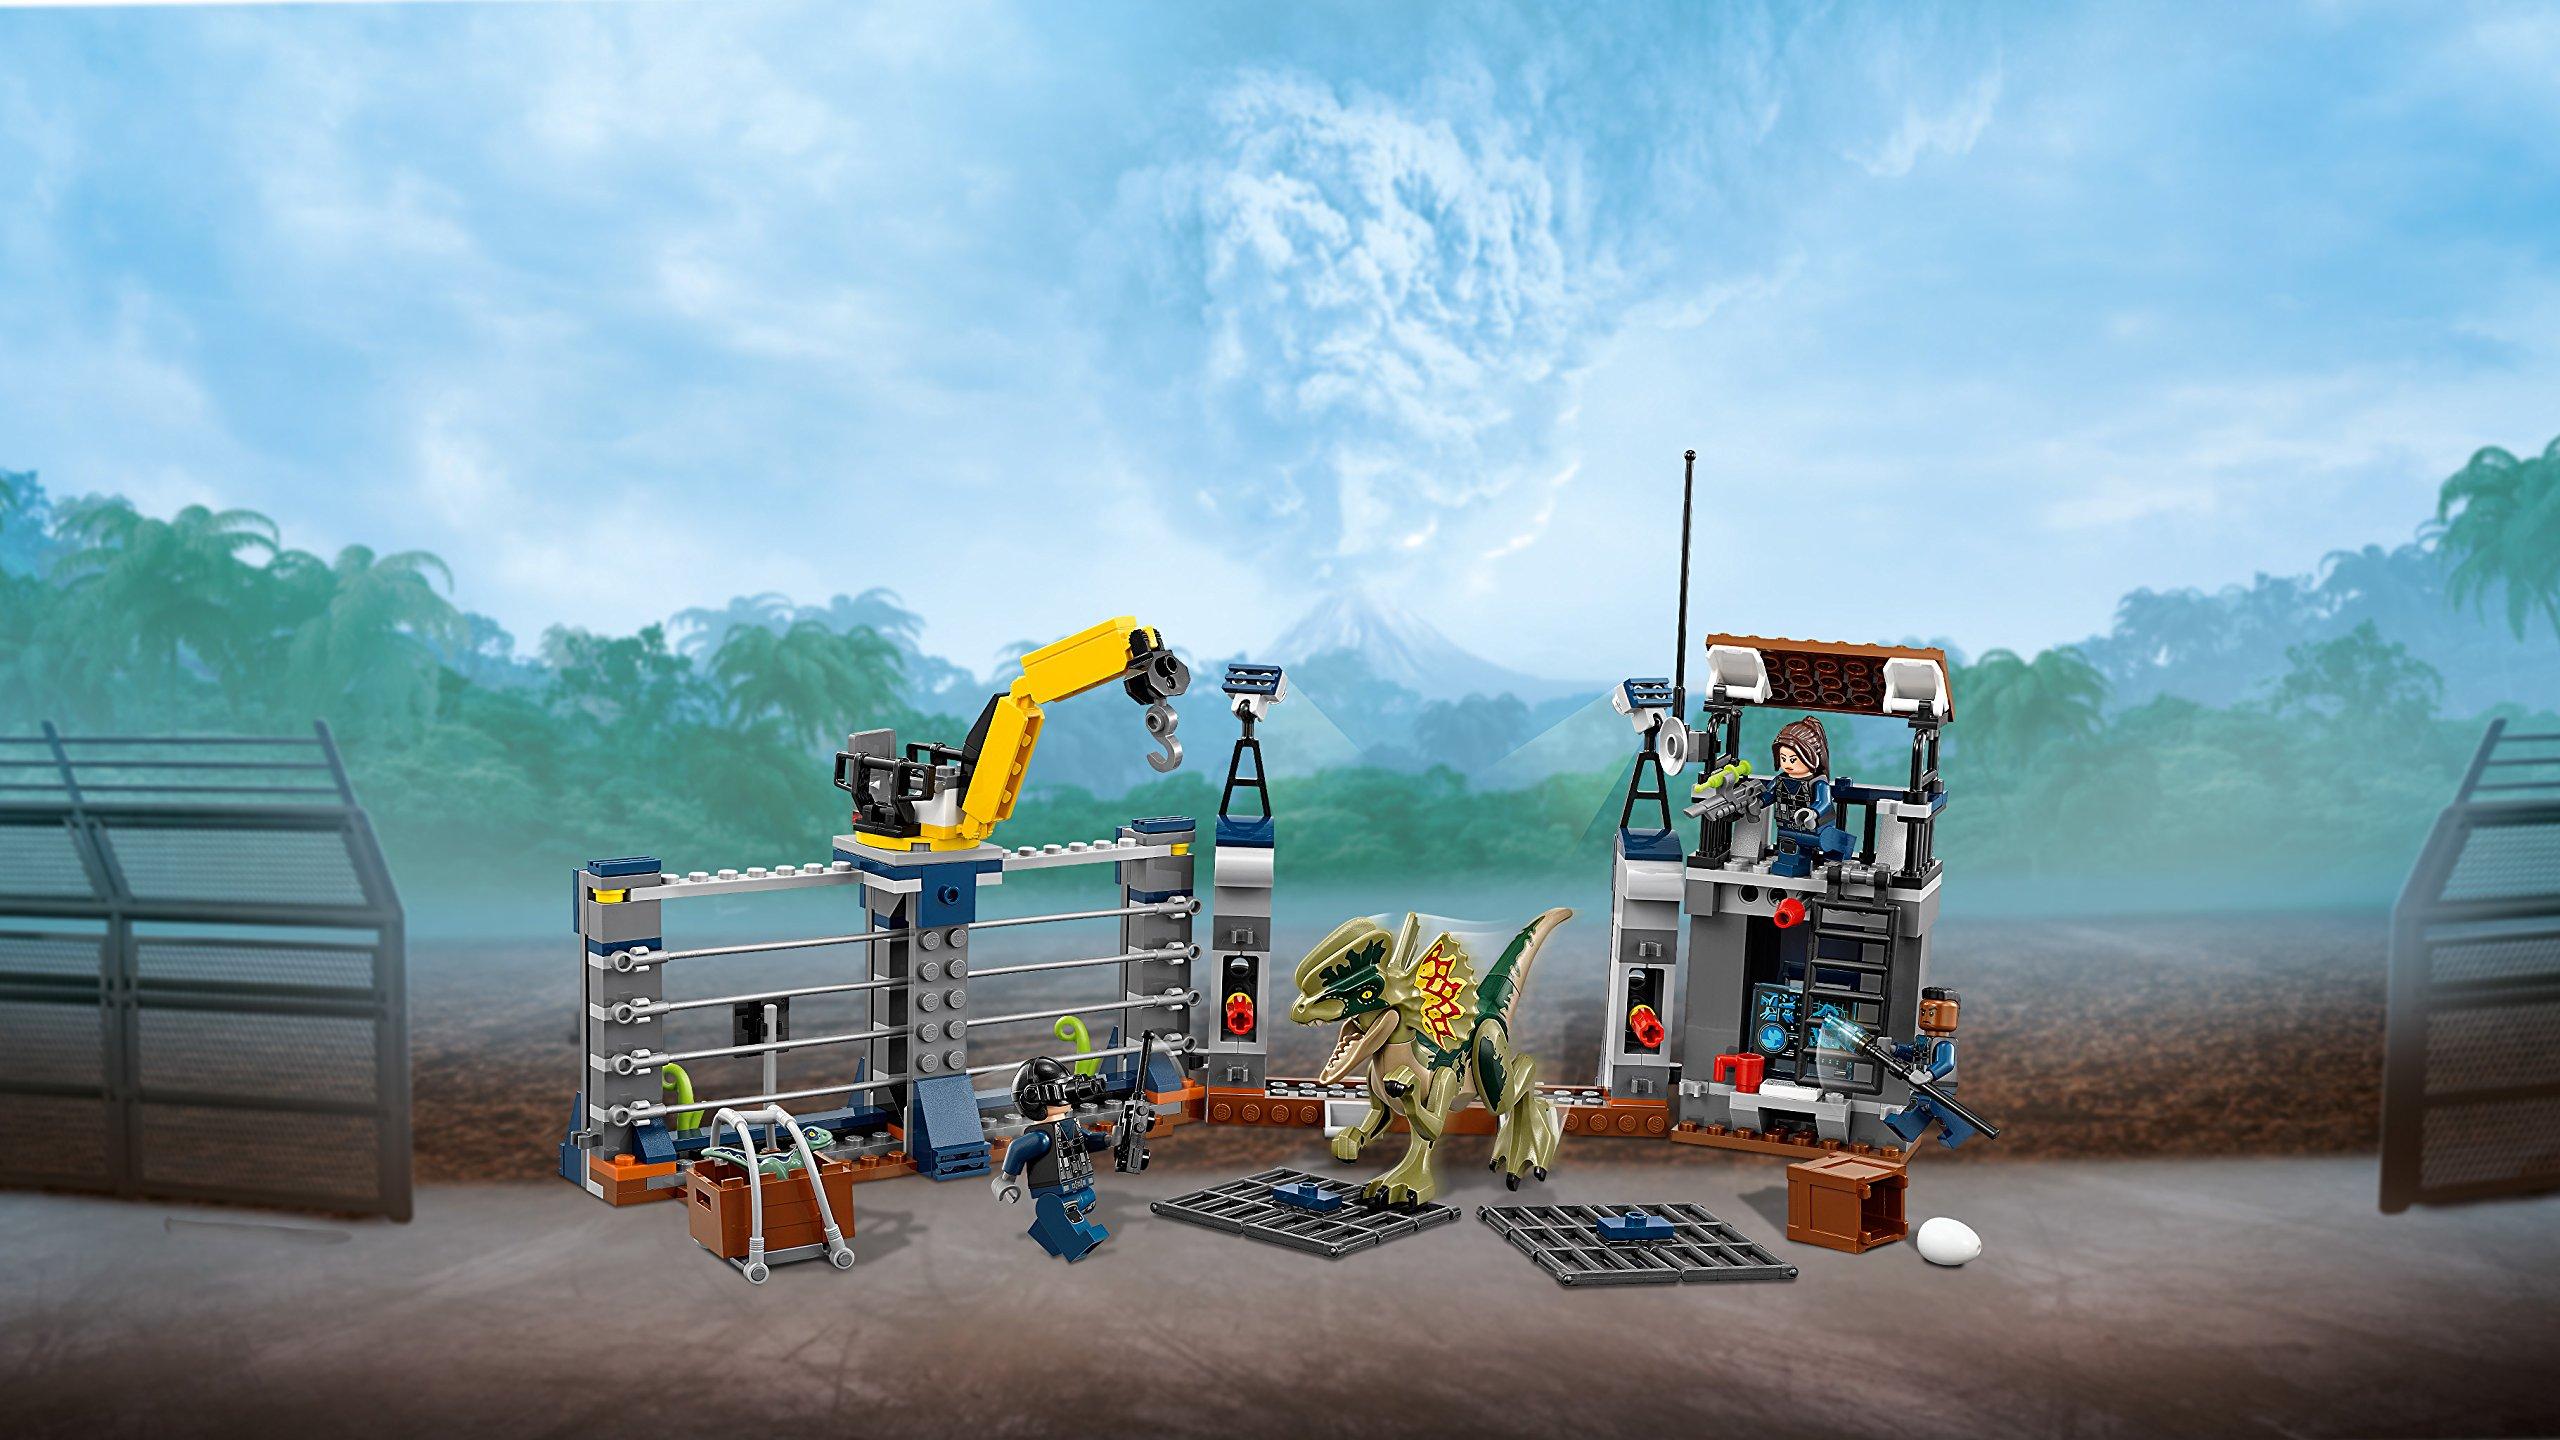 LEGO 75931 Jurassic World Dilophosaurus Outpost Attack Playset, Dinosaur Figures, Build & Play Dinosaur Toys for Kids by LEGO (Image #6)